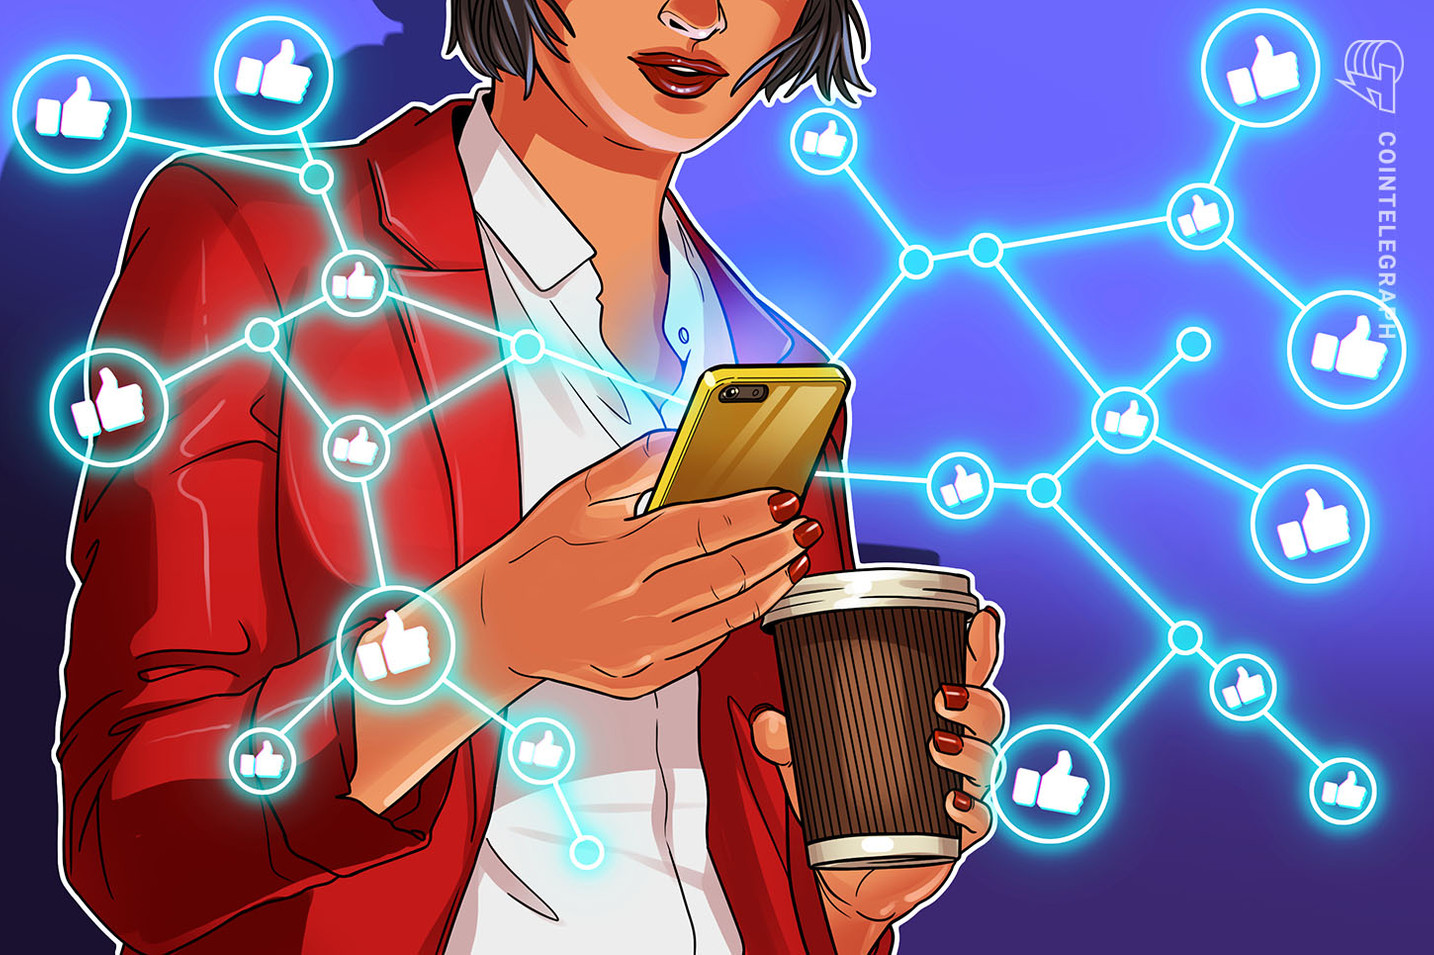 Blockchain can help publishers improve audience trust